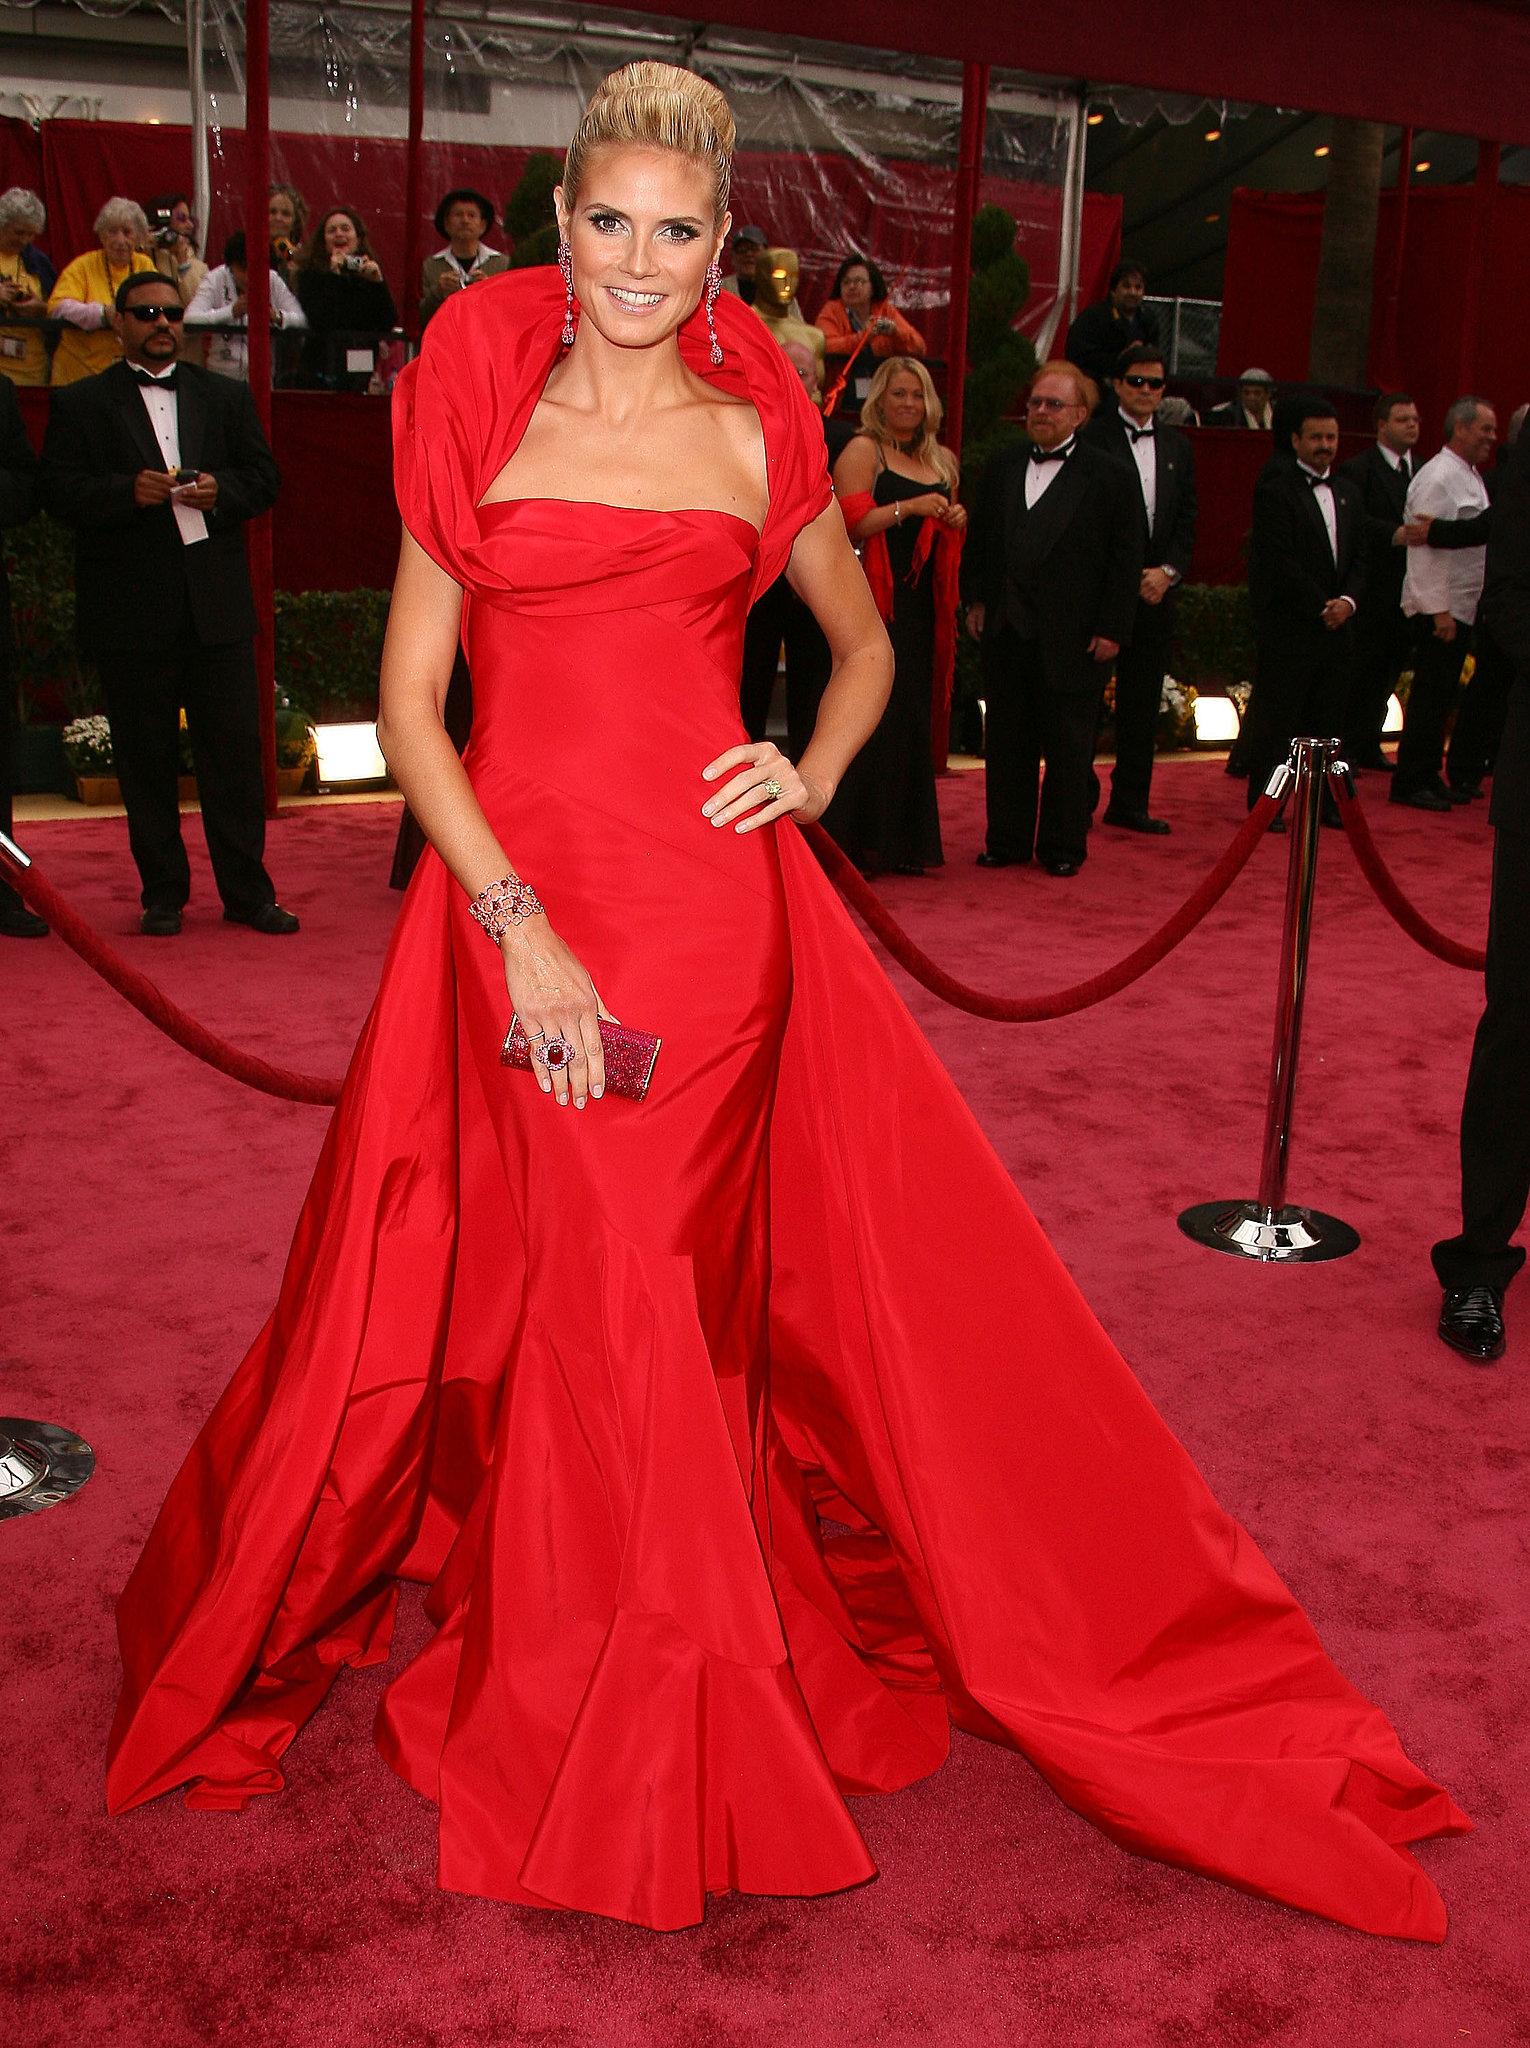 Heidi Klum in a Red Christian Dior at the 2008 Oscars